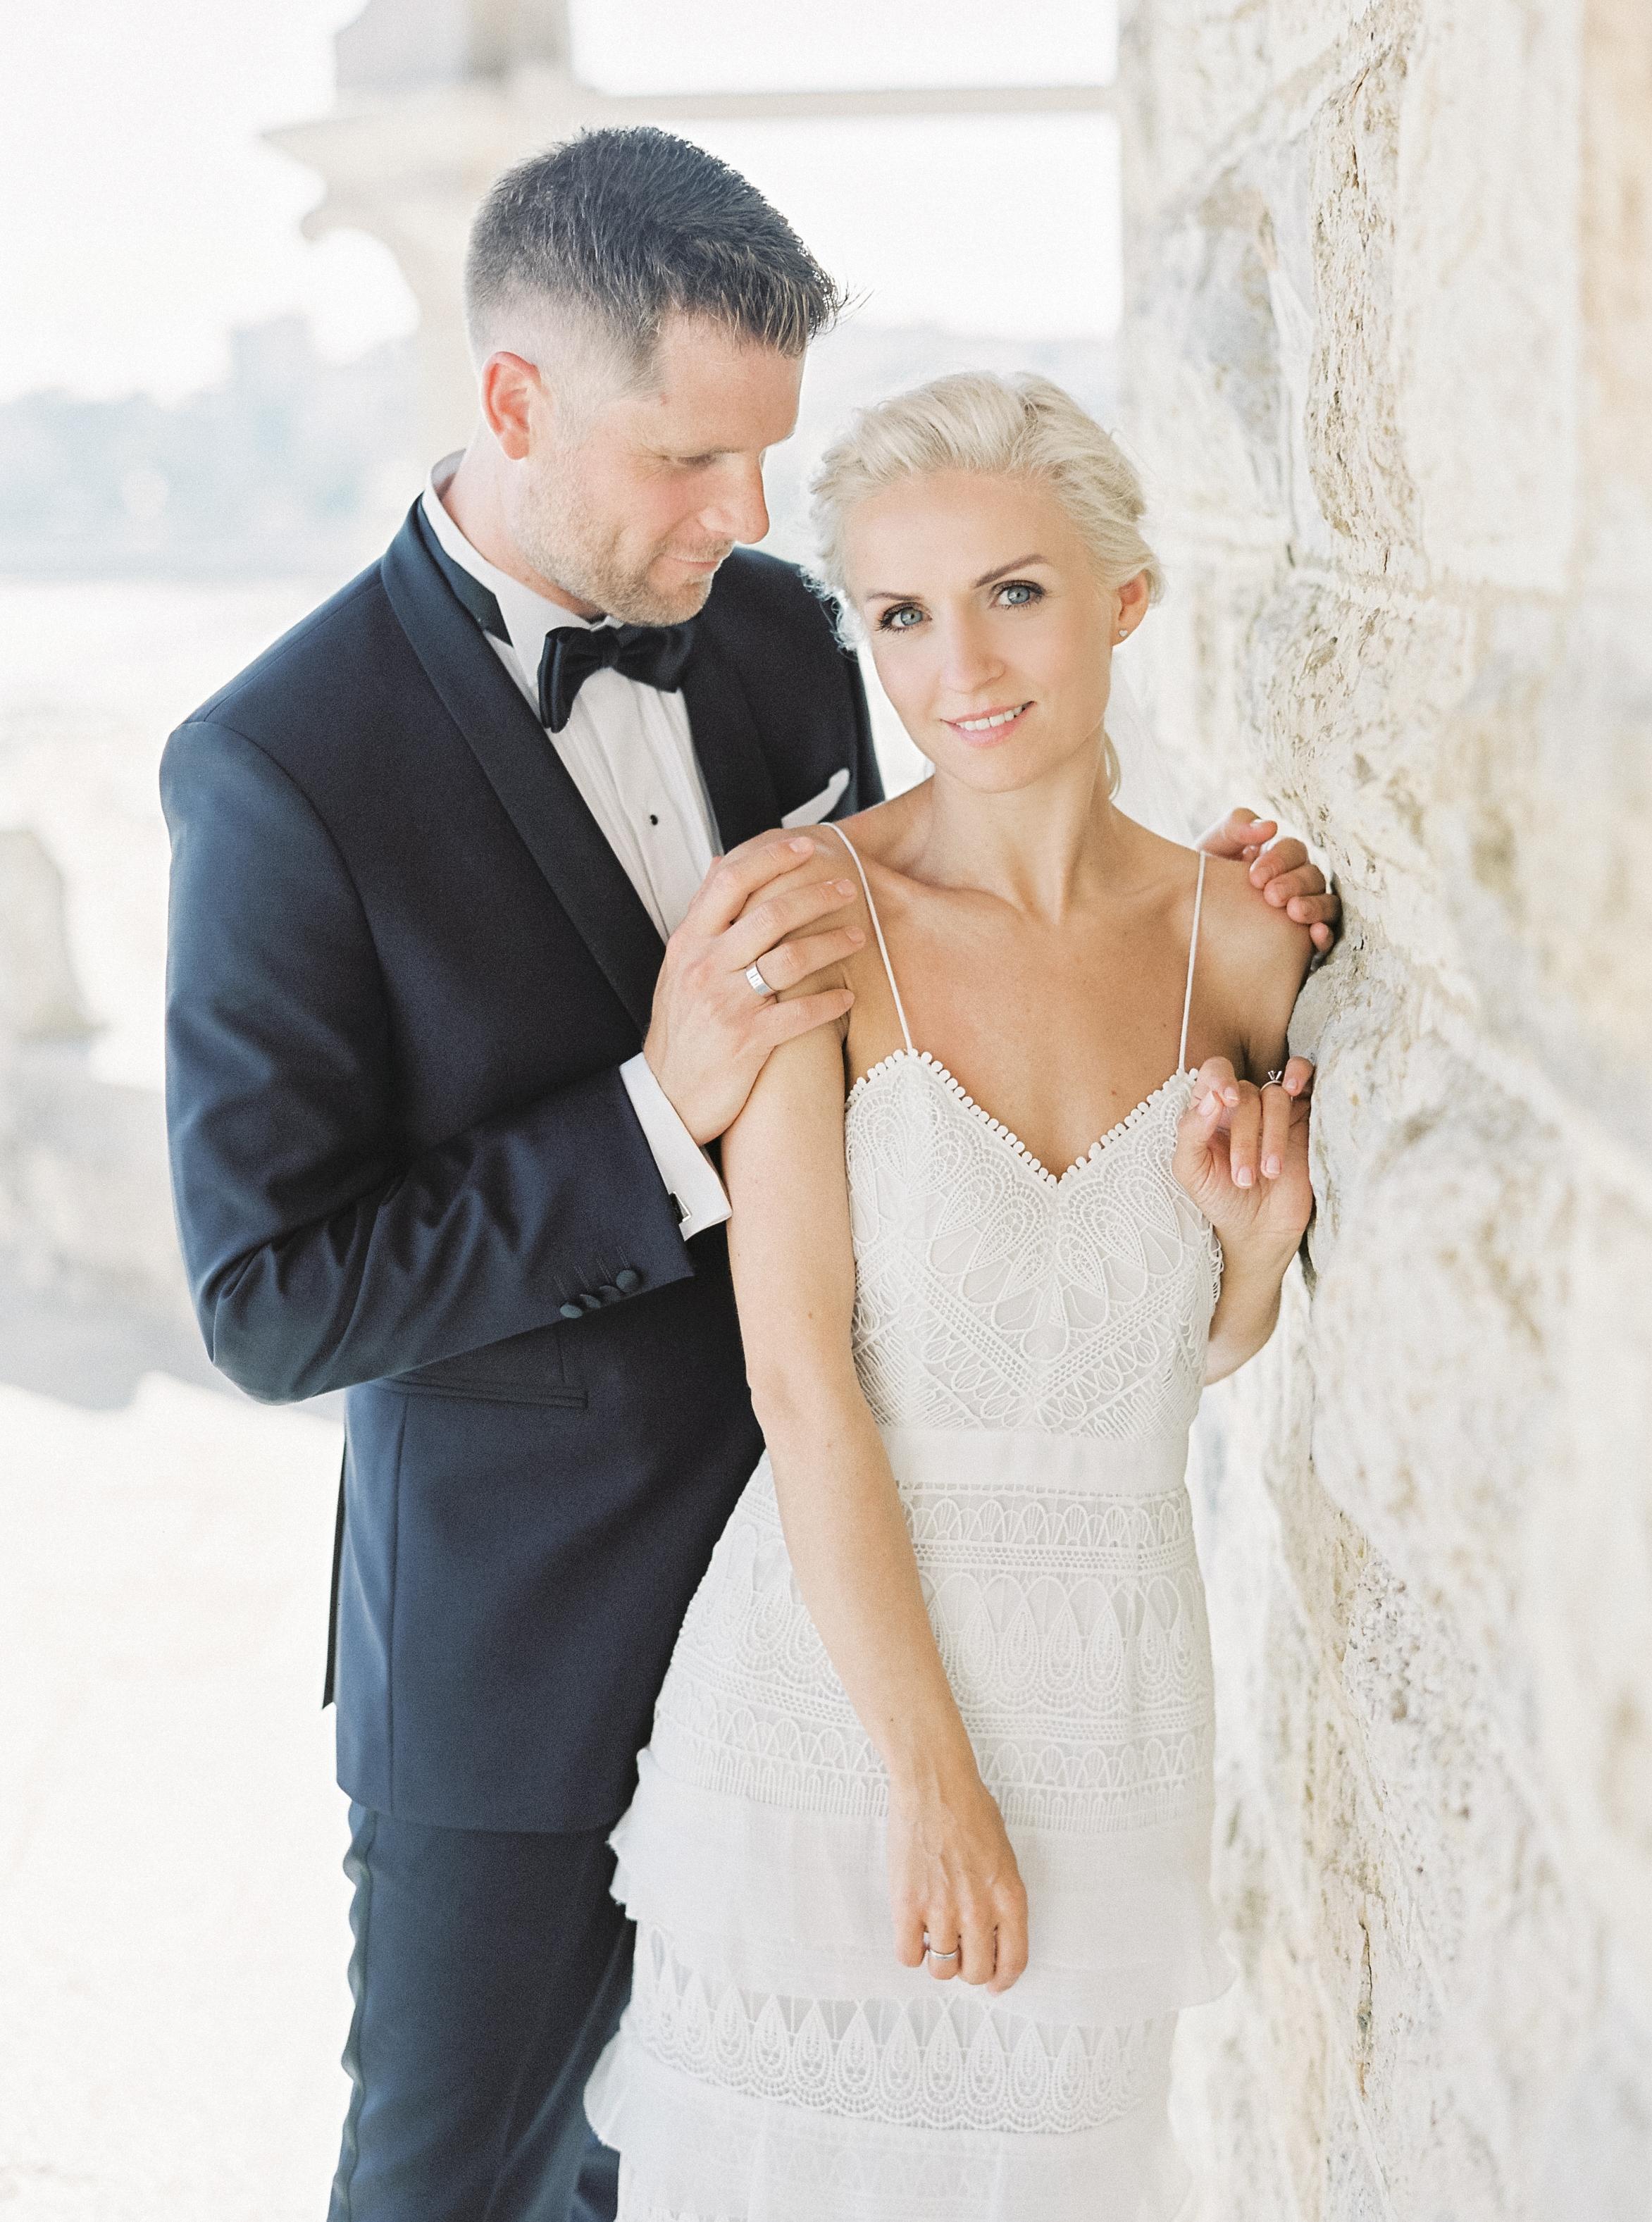 Nastia_Vesna_Photography_Wedding_Portugal_19.jpg